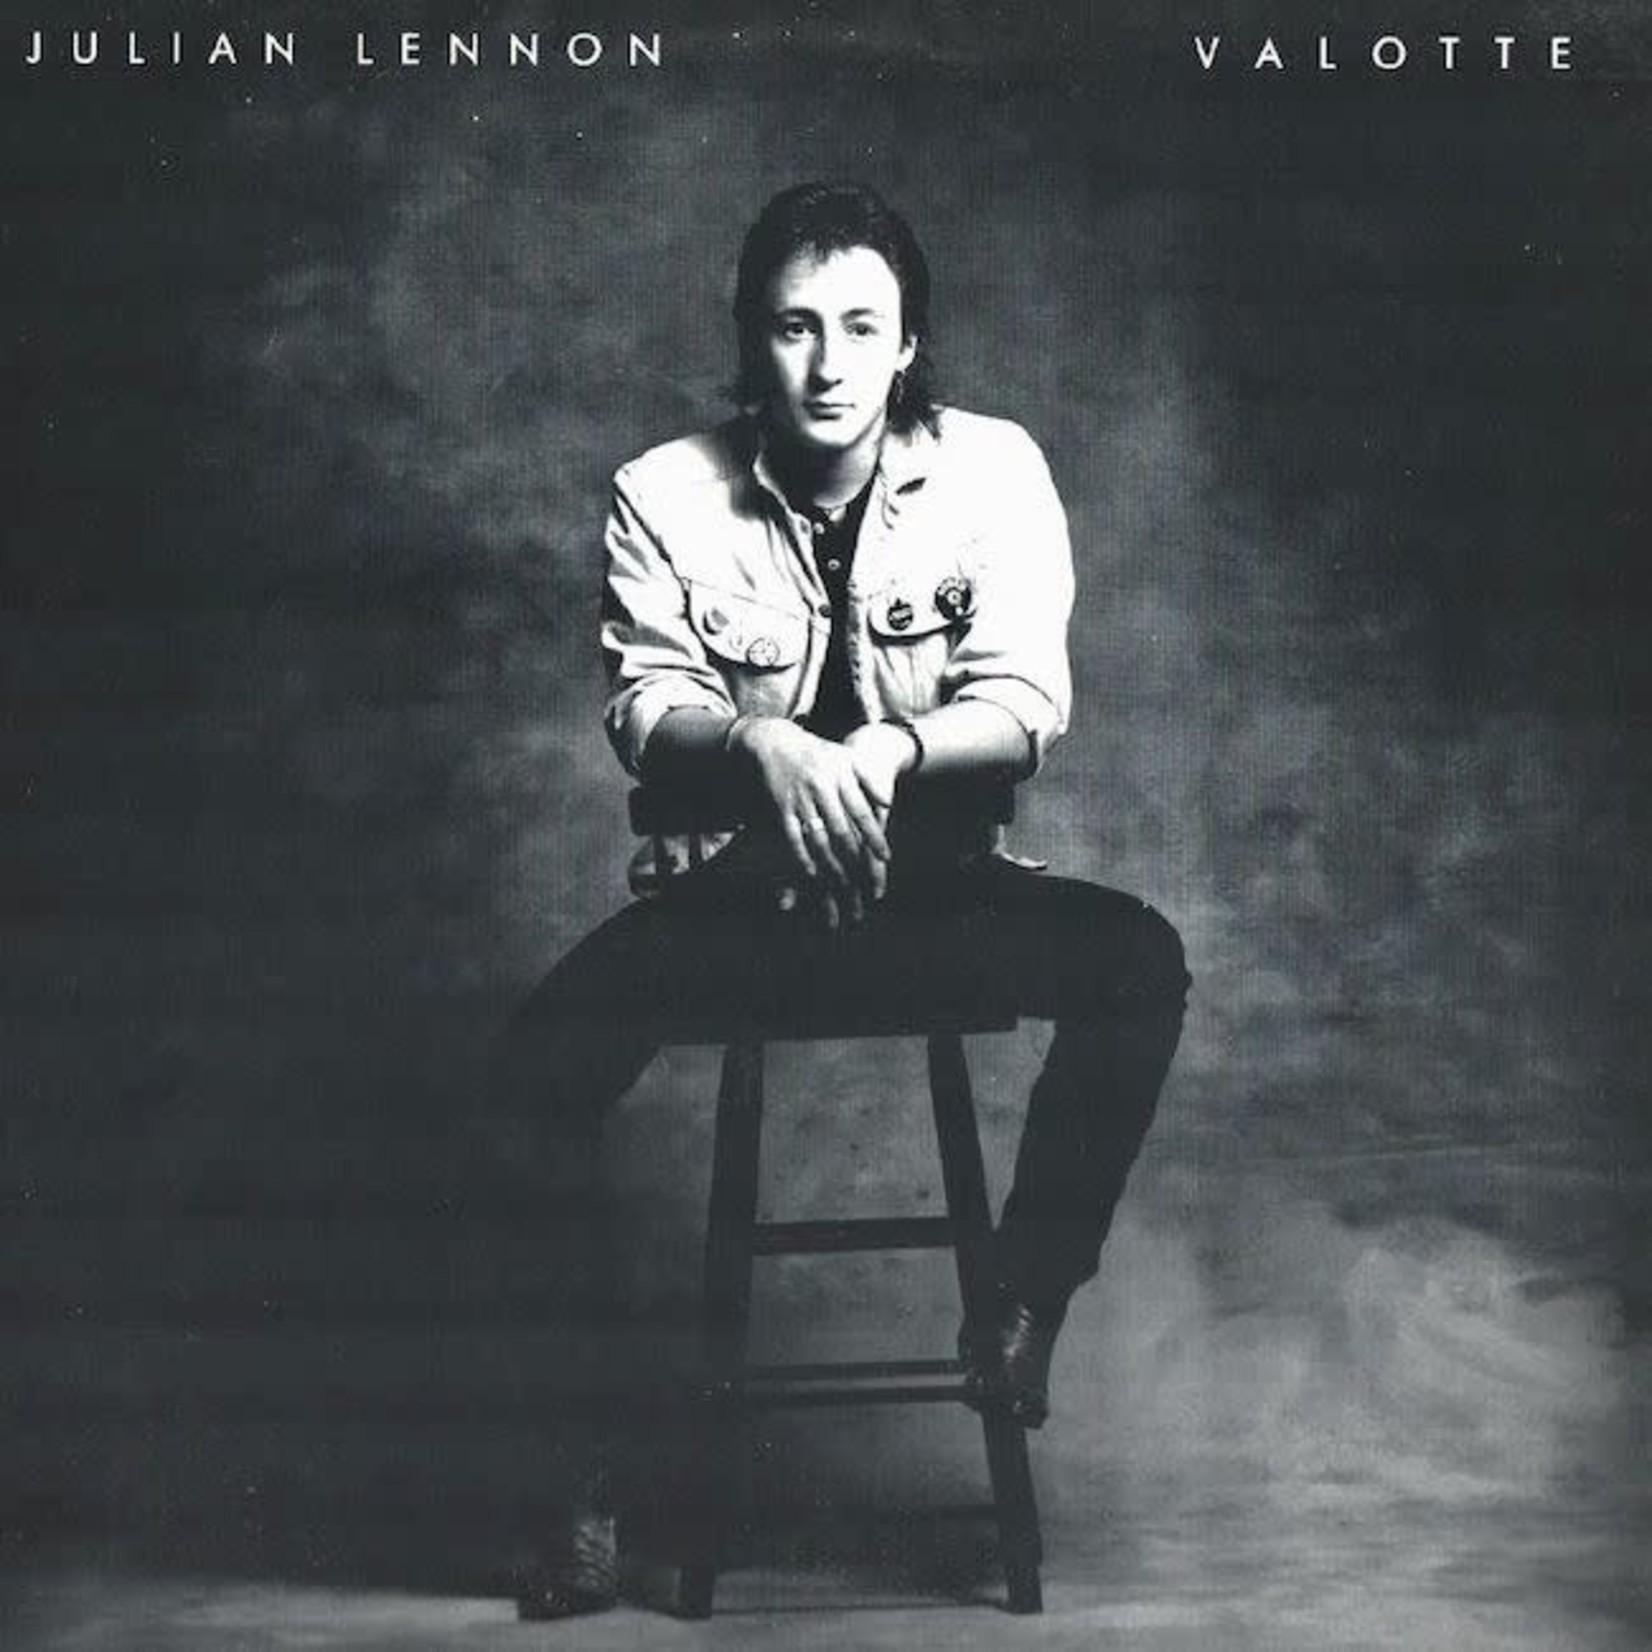 [Vintage] Lennon, Julian: Valotte